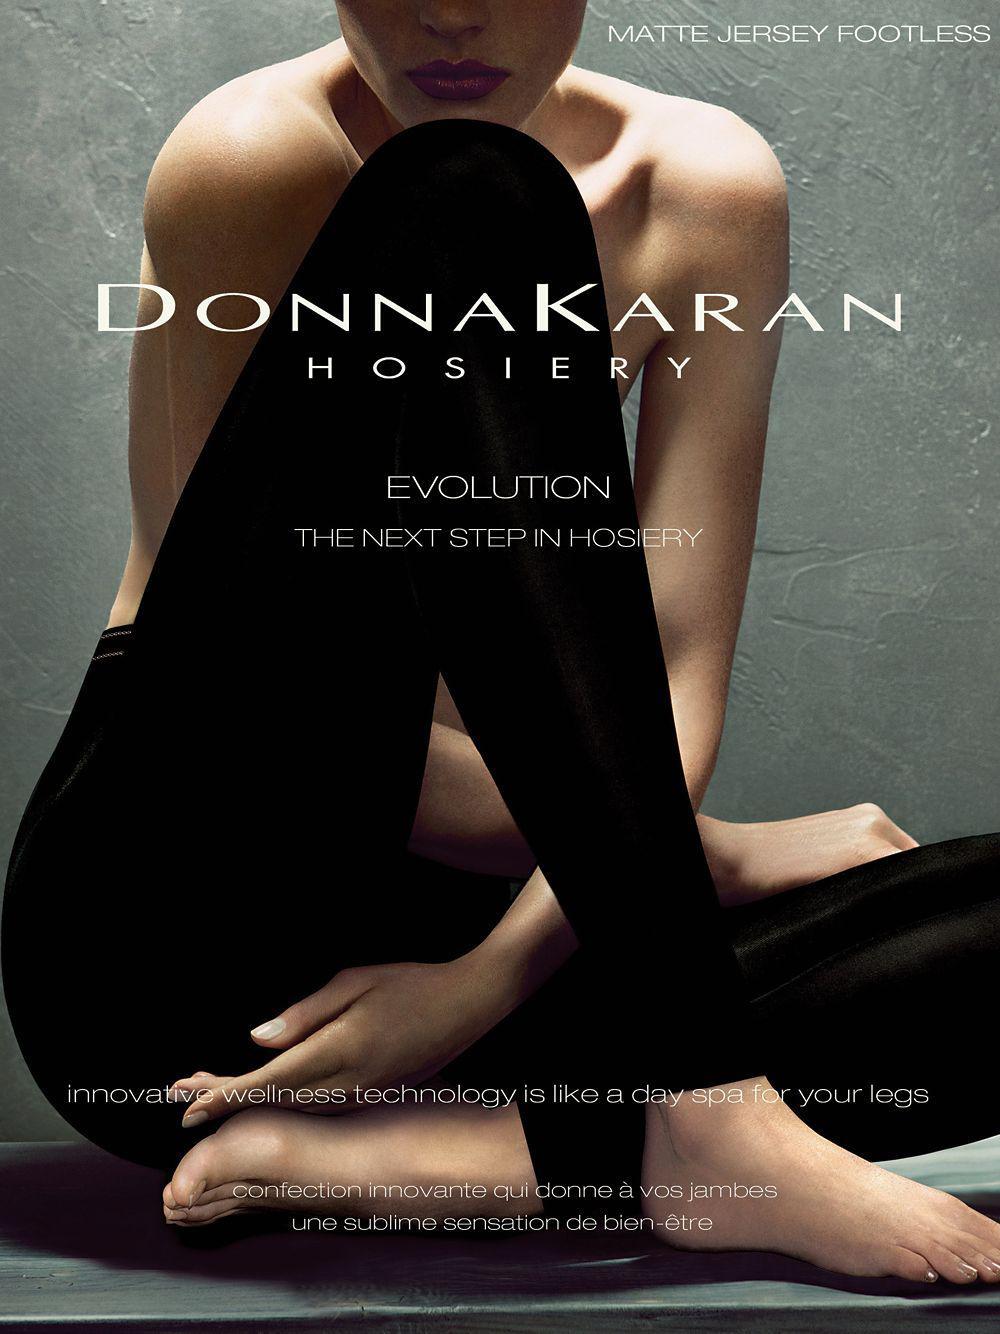 306da0f483 Donna Karan - Black Matte Jersey Footless Tights - Lyst. View fullscreen